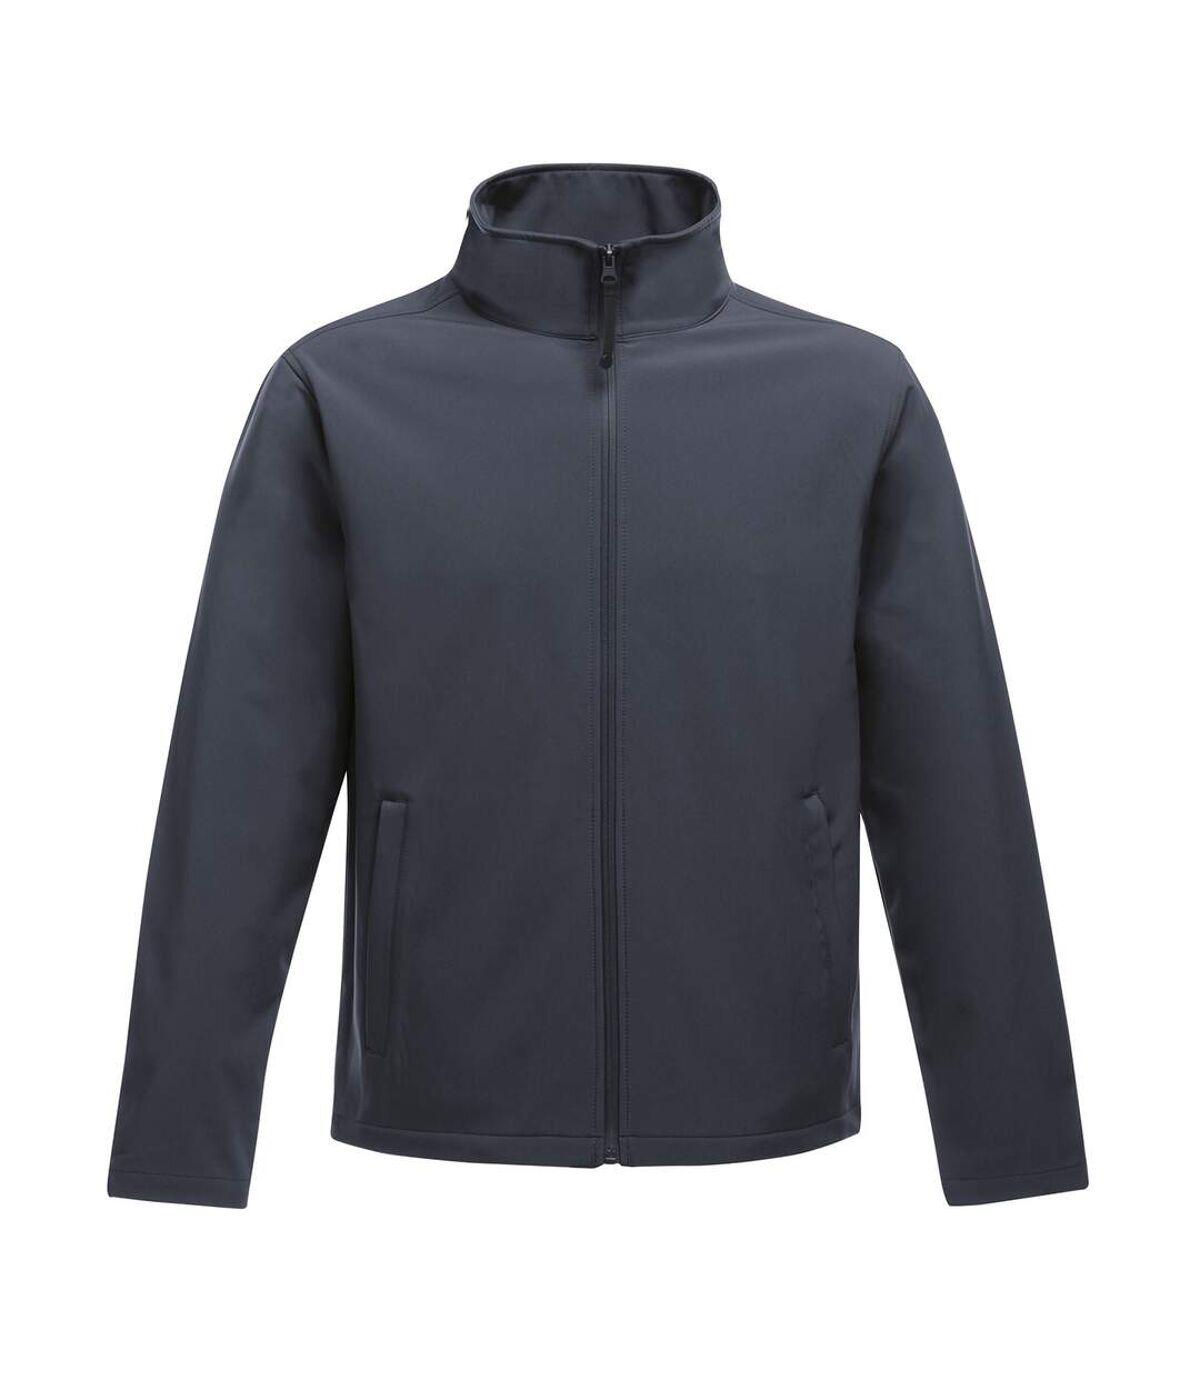 Regatta Standout Mens Ablaze Printable Softshell Jacket (Navy) - UTRW6353